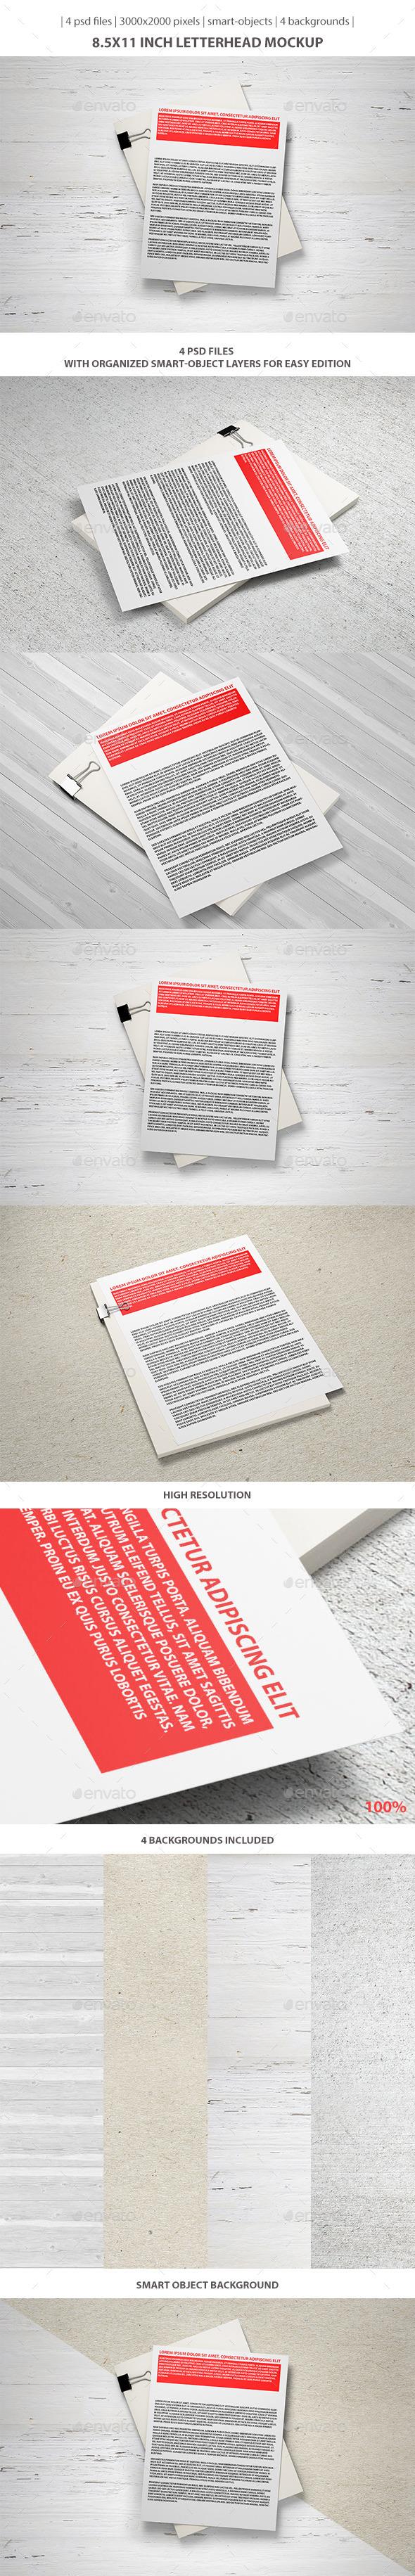 8.5x11 inch Letterhead Mockup - Stationery Print